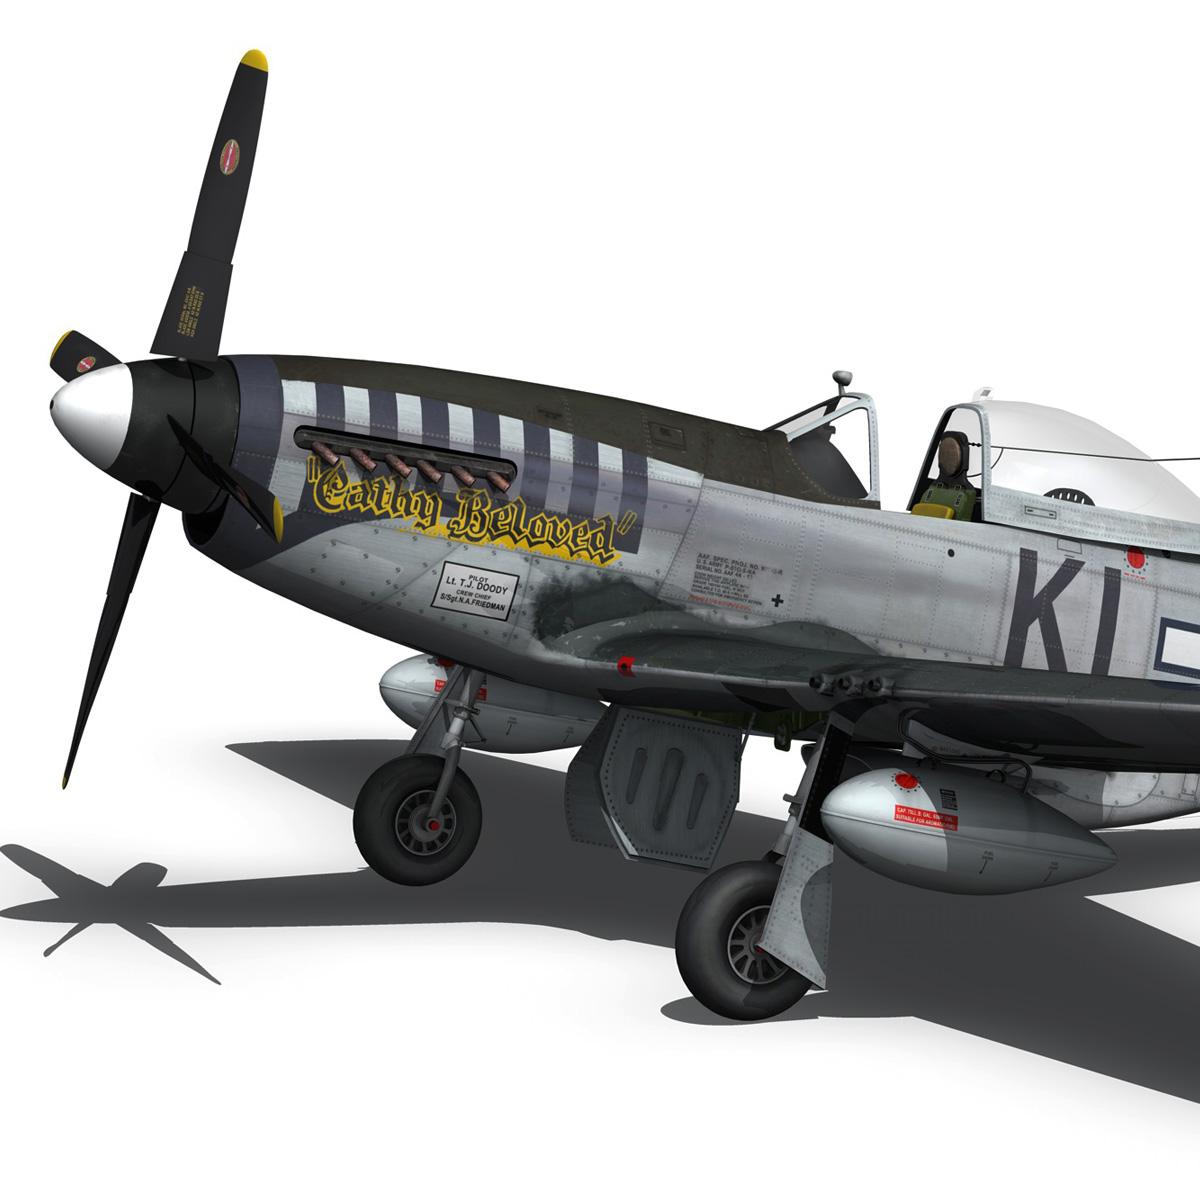 north american p-51d mustang – cathy beloved 3d model fbx lwo lw lws obj c4d 266537